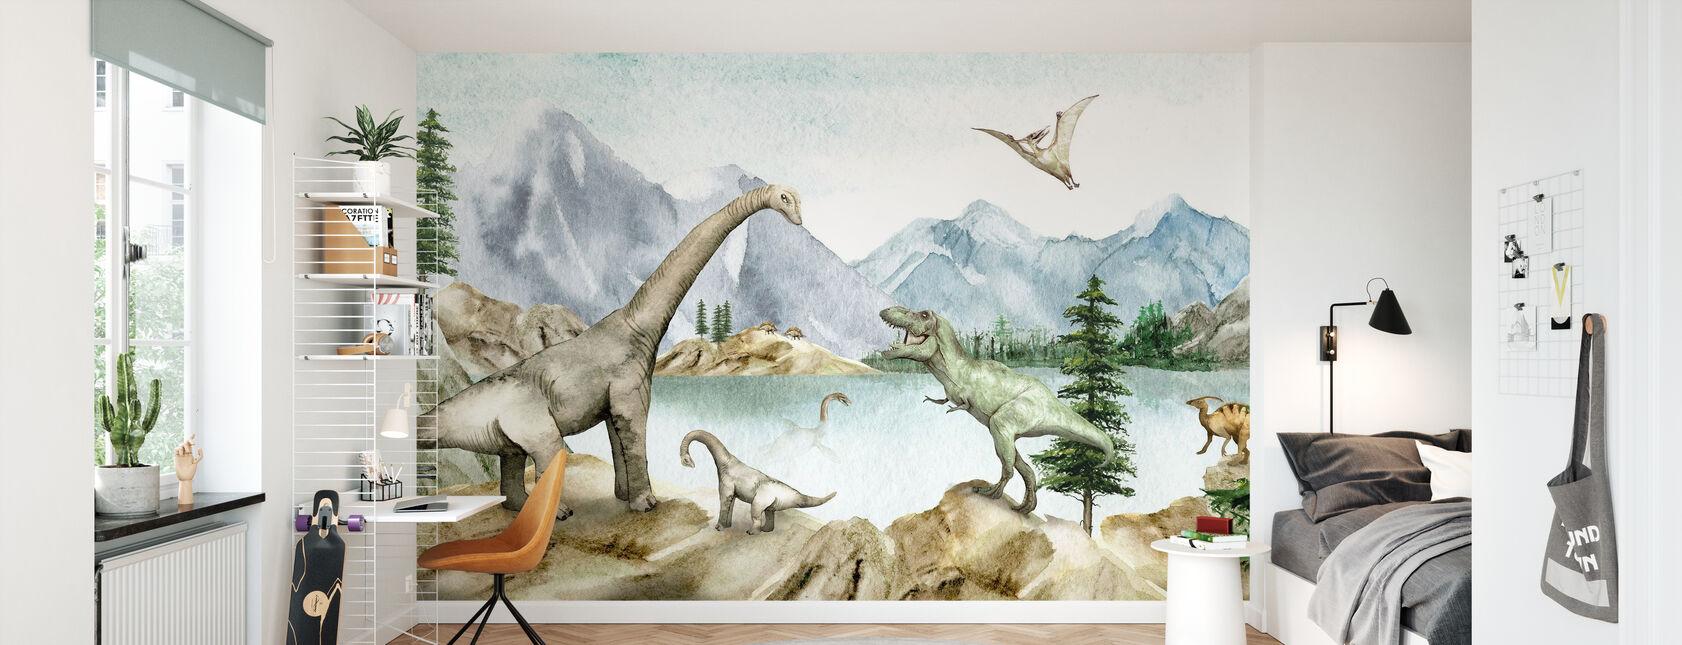 Dino-träume - Tapete - Kinderzimmer